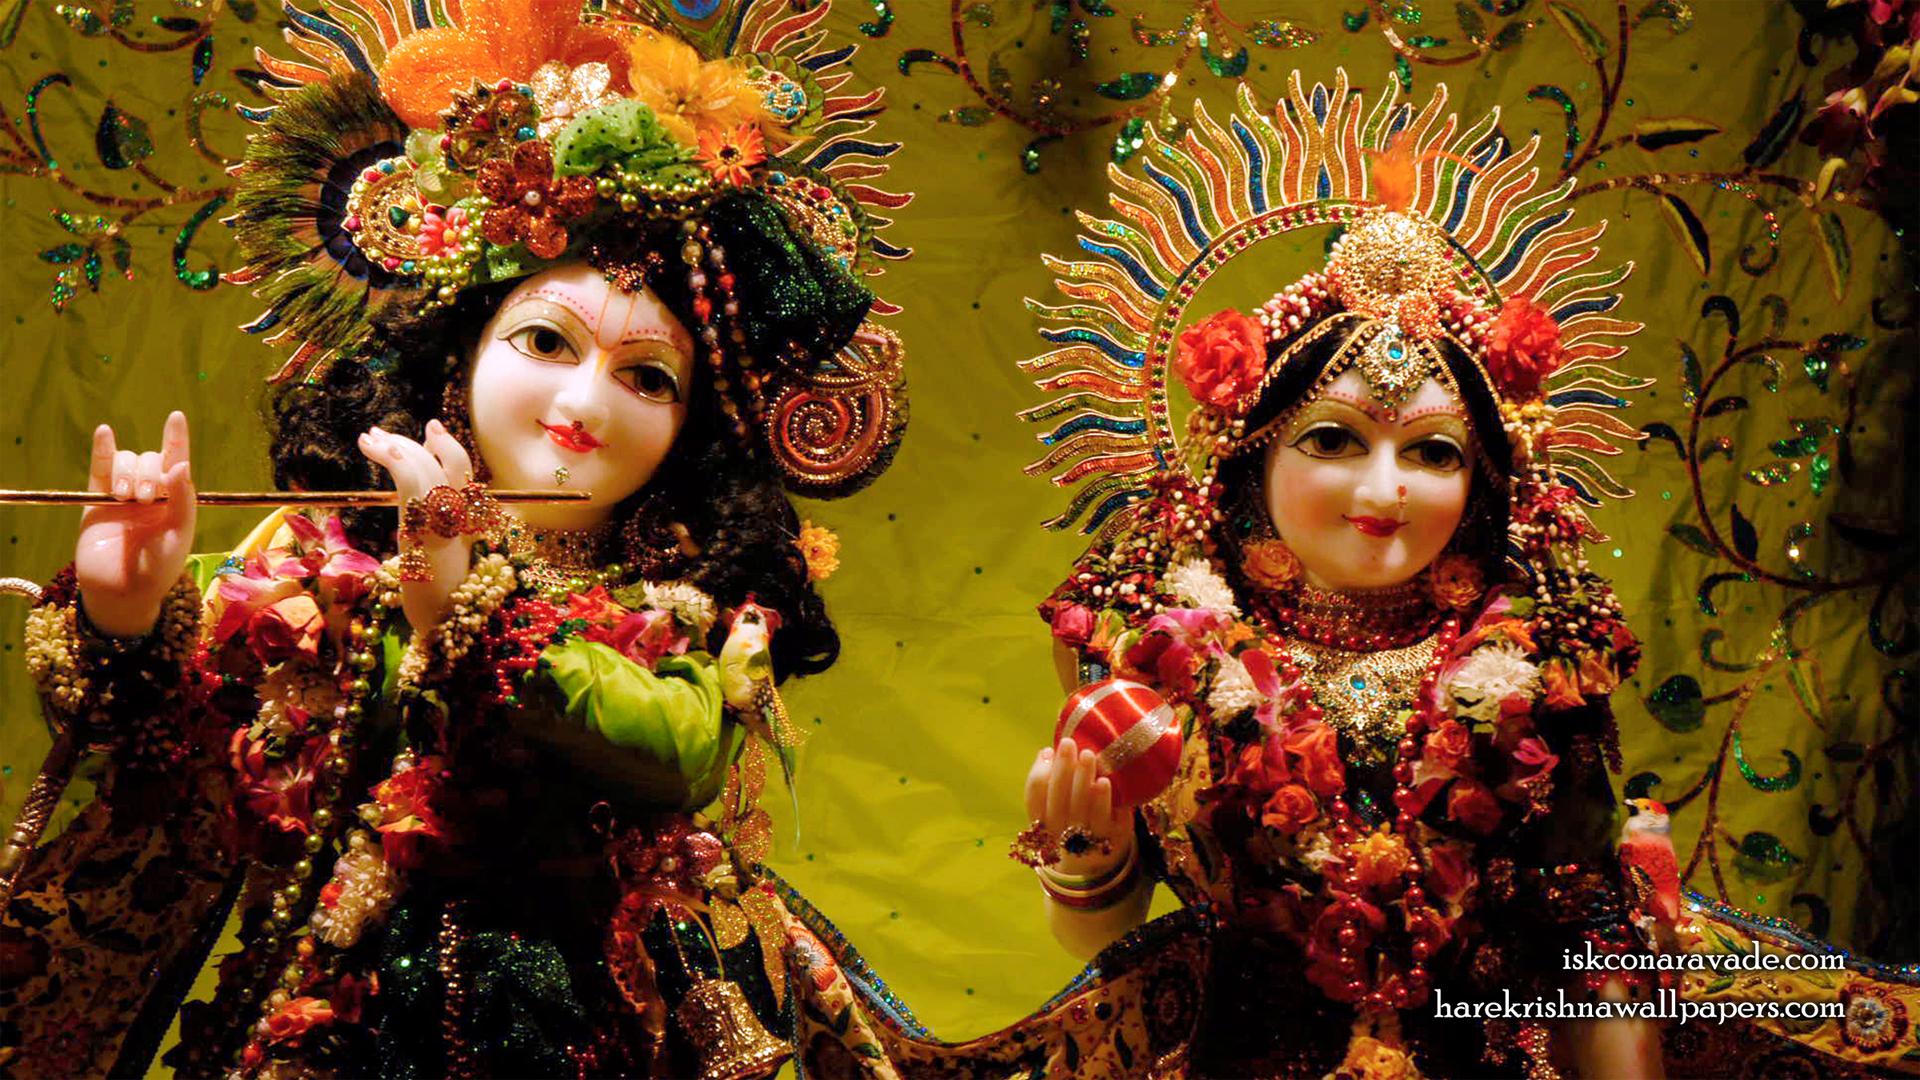 Sri Sri Radha Gopal Close up Wallpaper (001) Size 1920x1080 Download